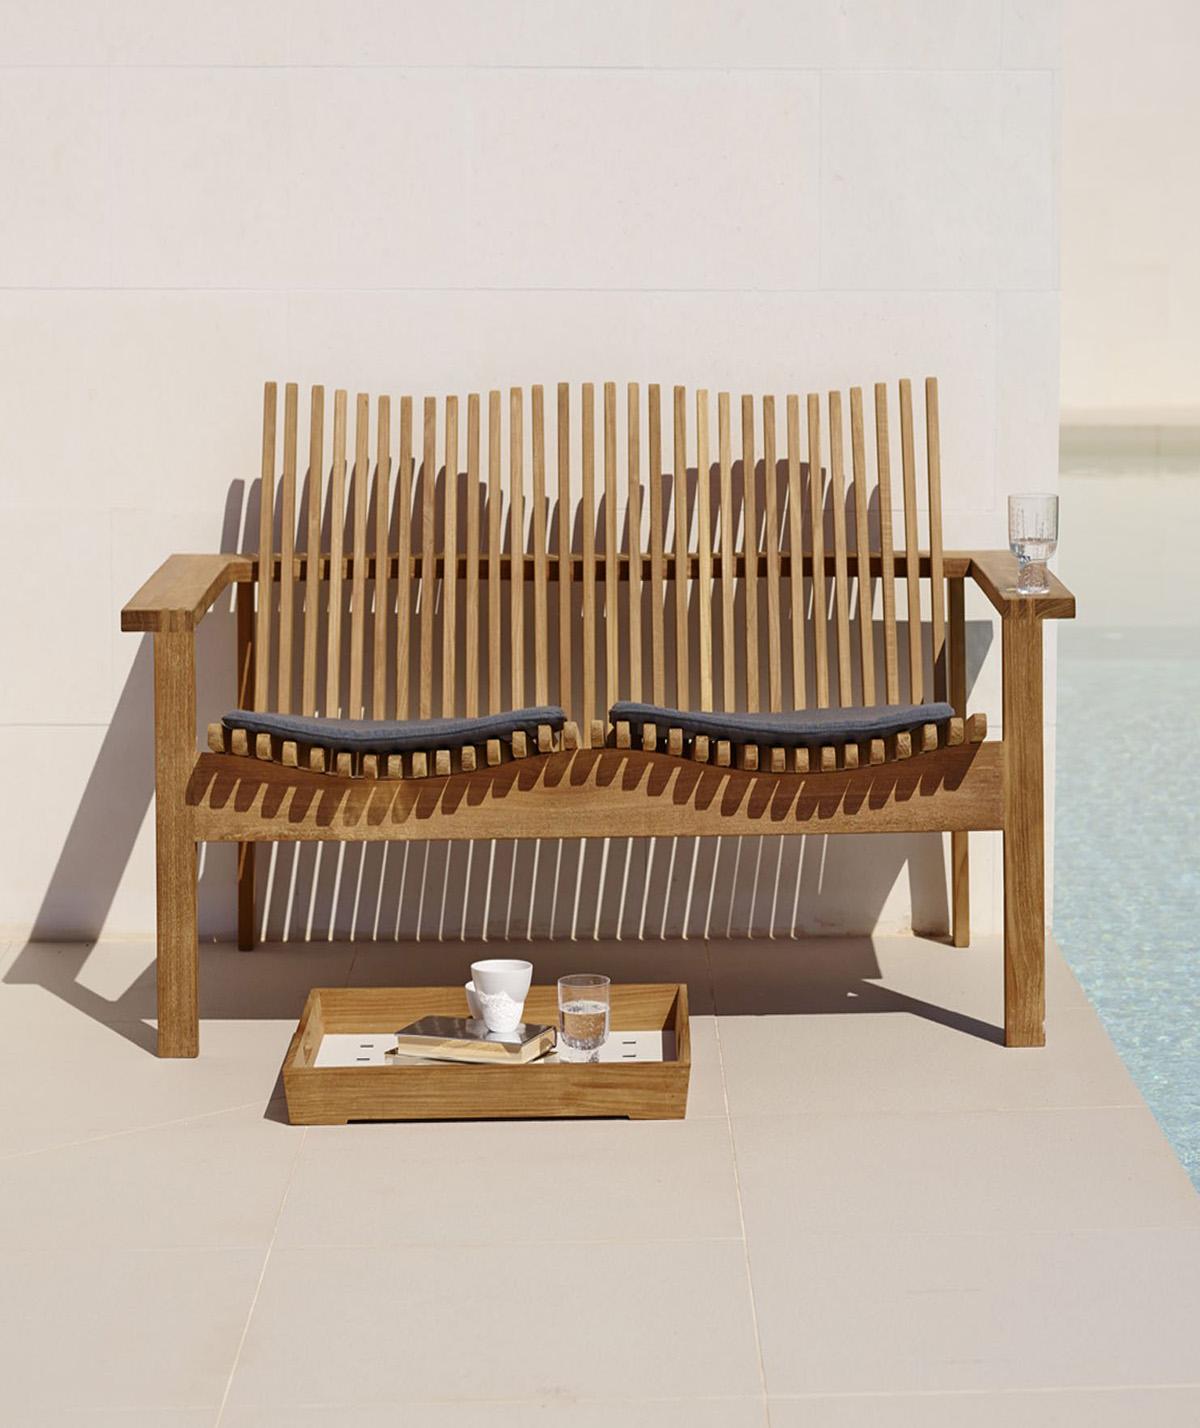 amaze stackable sofa garden furniture for summer